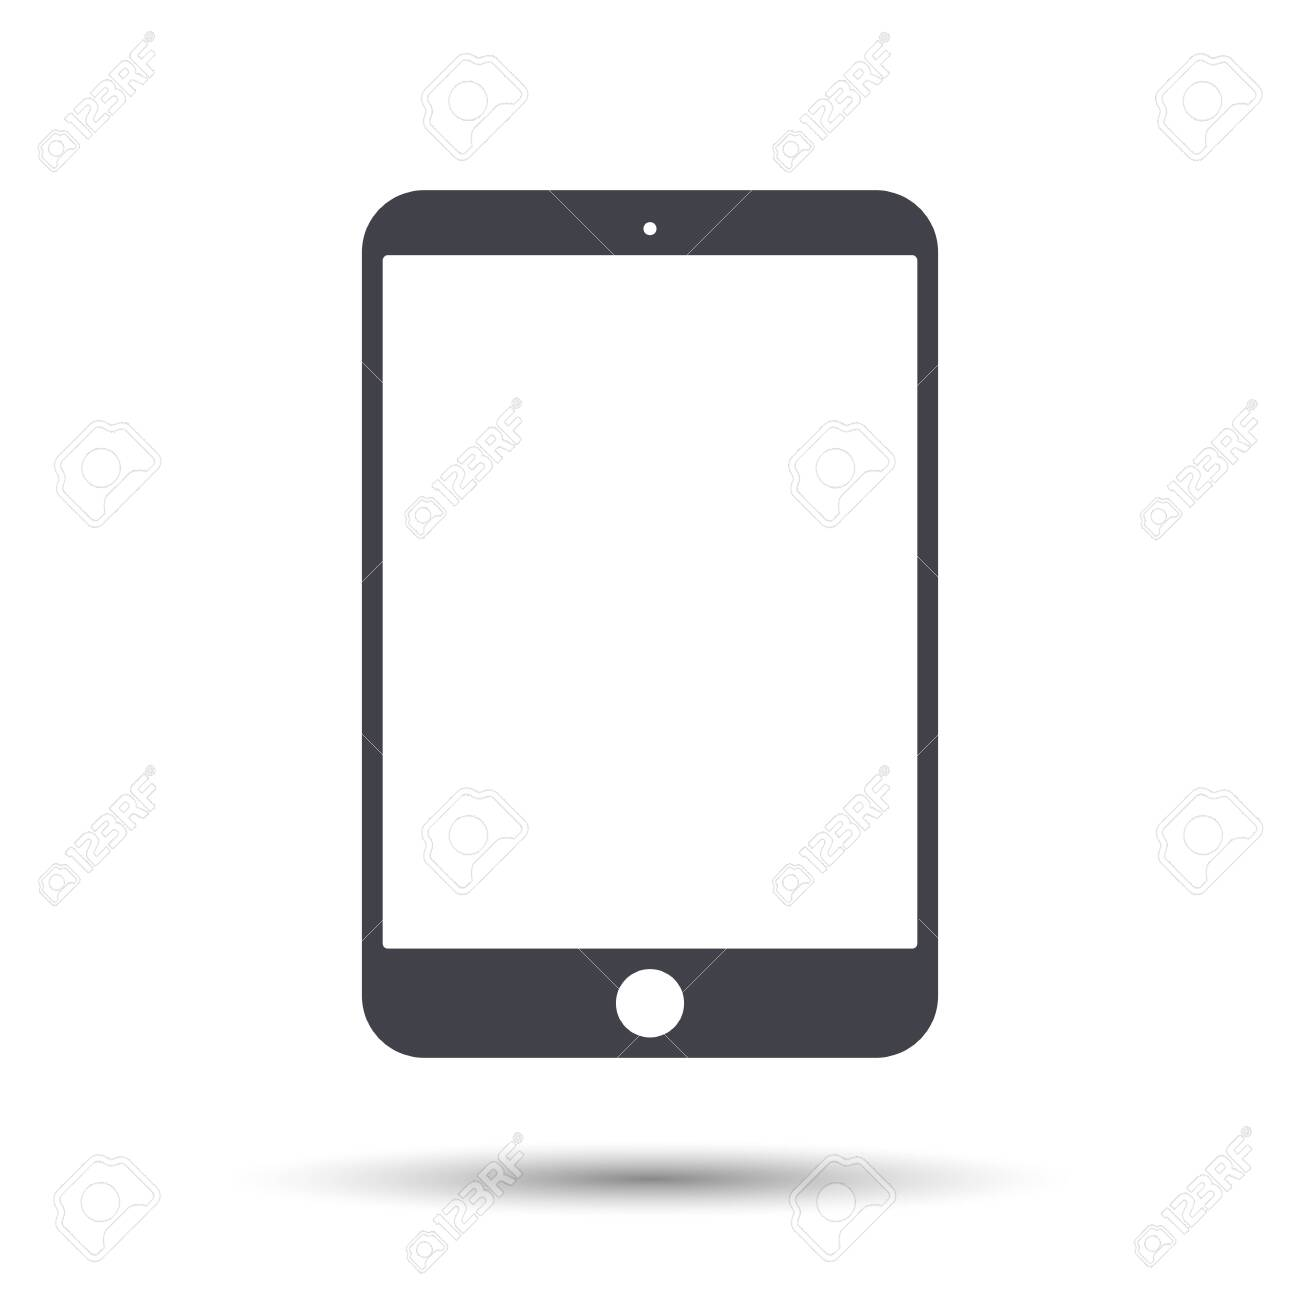 Tablet icon. Tablet vector icon, Tablet icon illustration, Tablet icon . Tablet icon flat. Tablet icon object. Tablet icon image. Tablet icon jpg Tablet icon pictogram. Tablet icon art stock vector. - 149618911